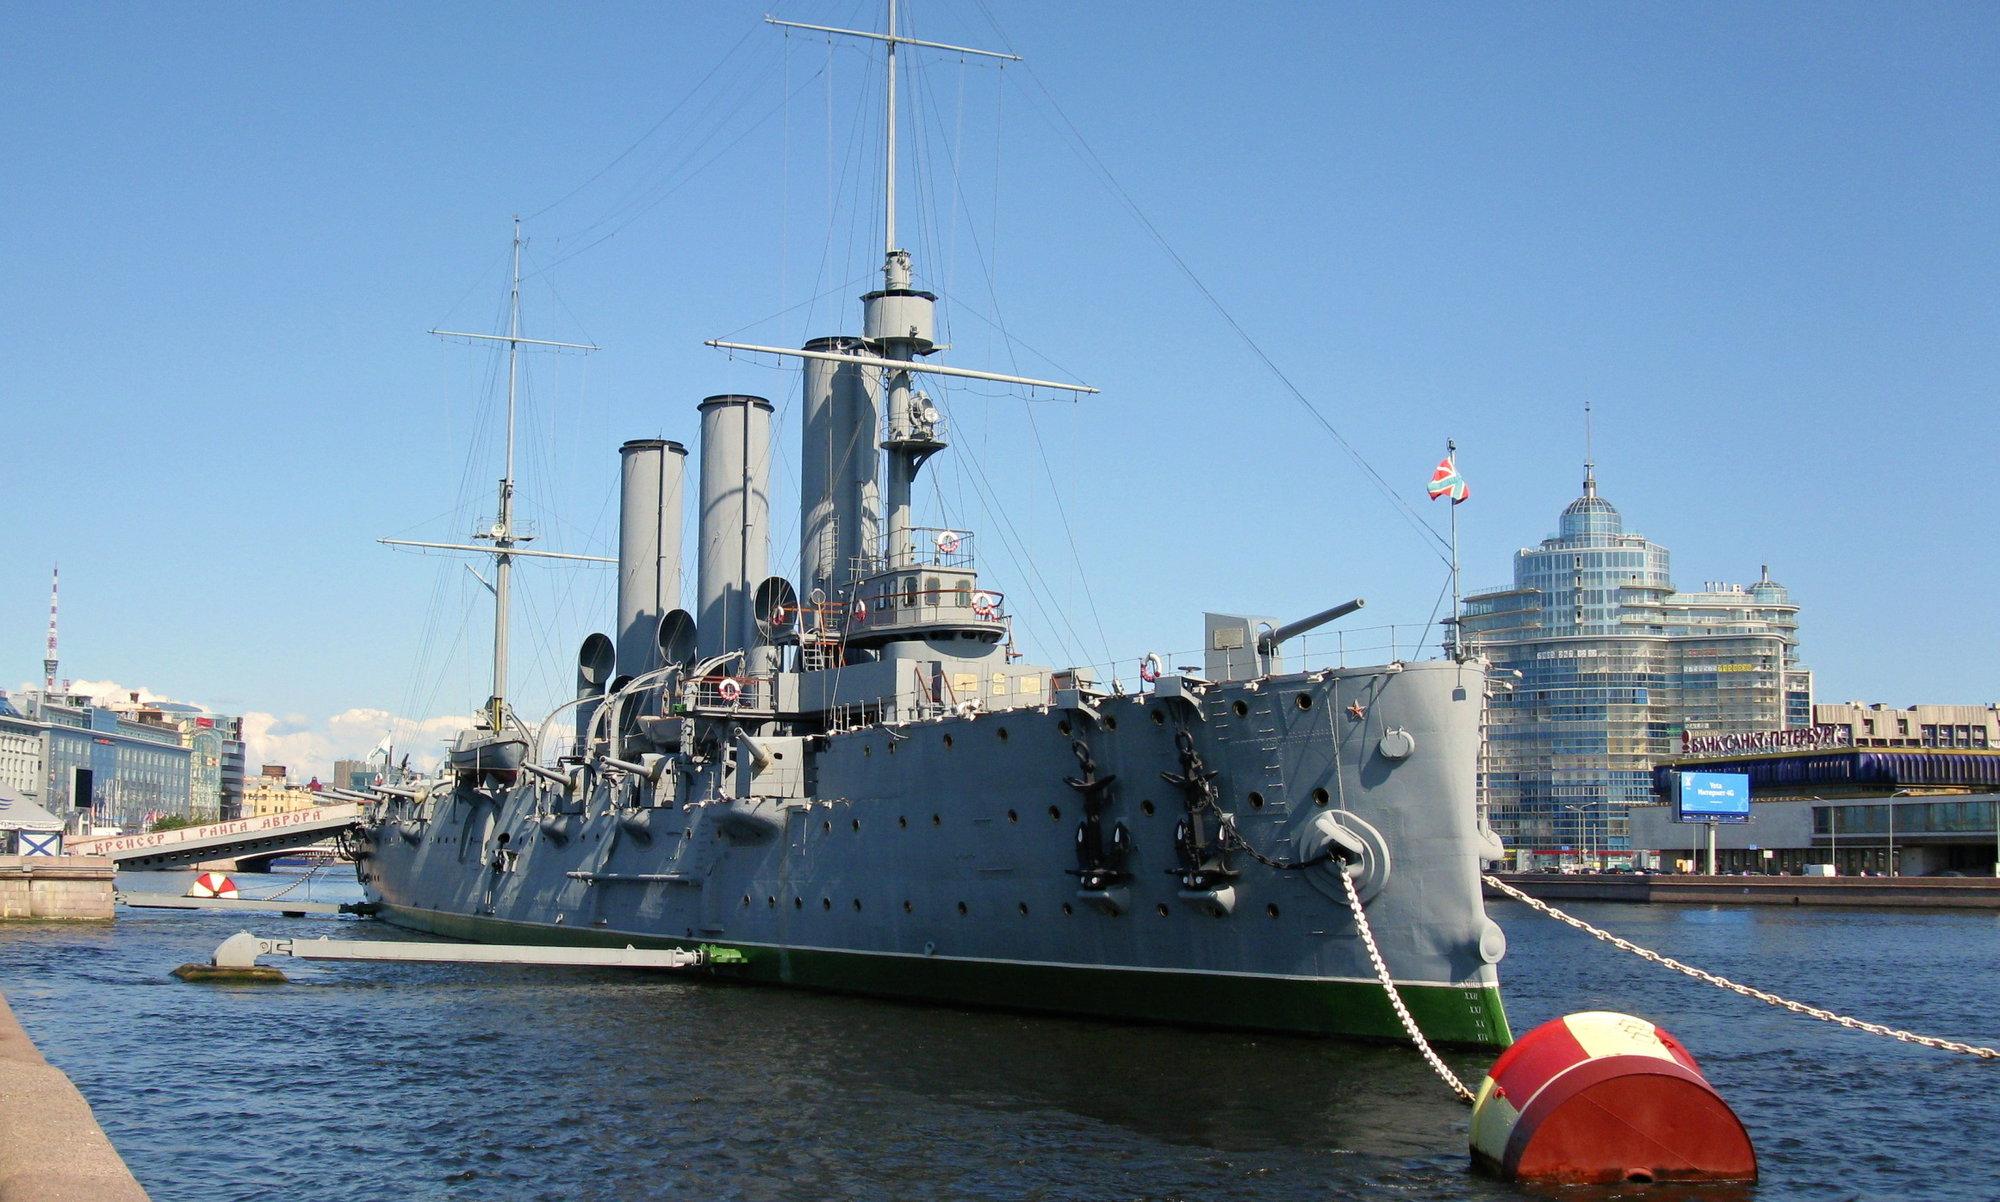 символ Санкт-Петербурга - крейсер Аврора